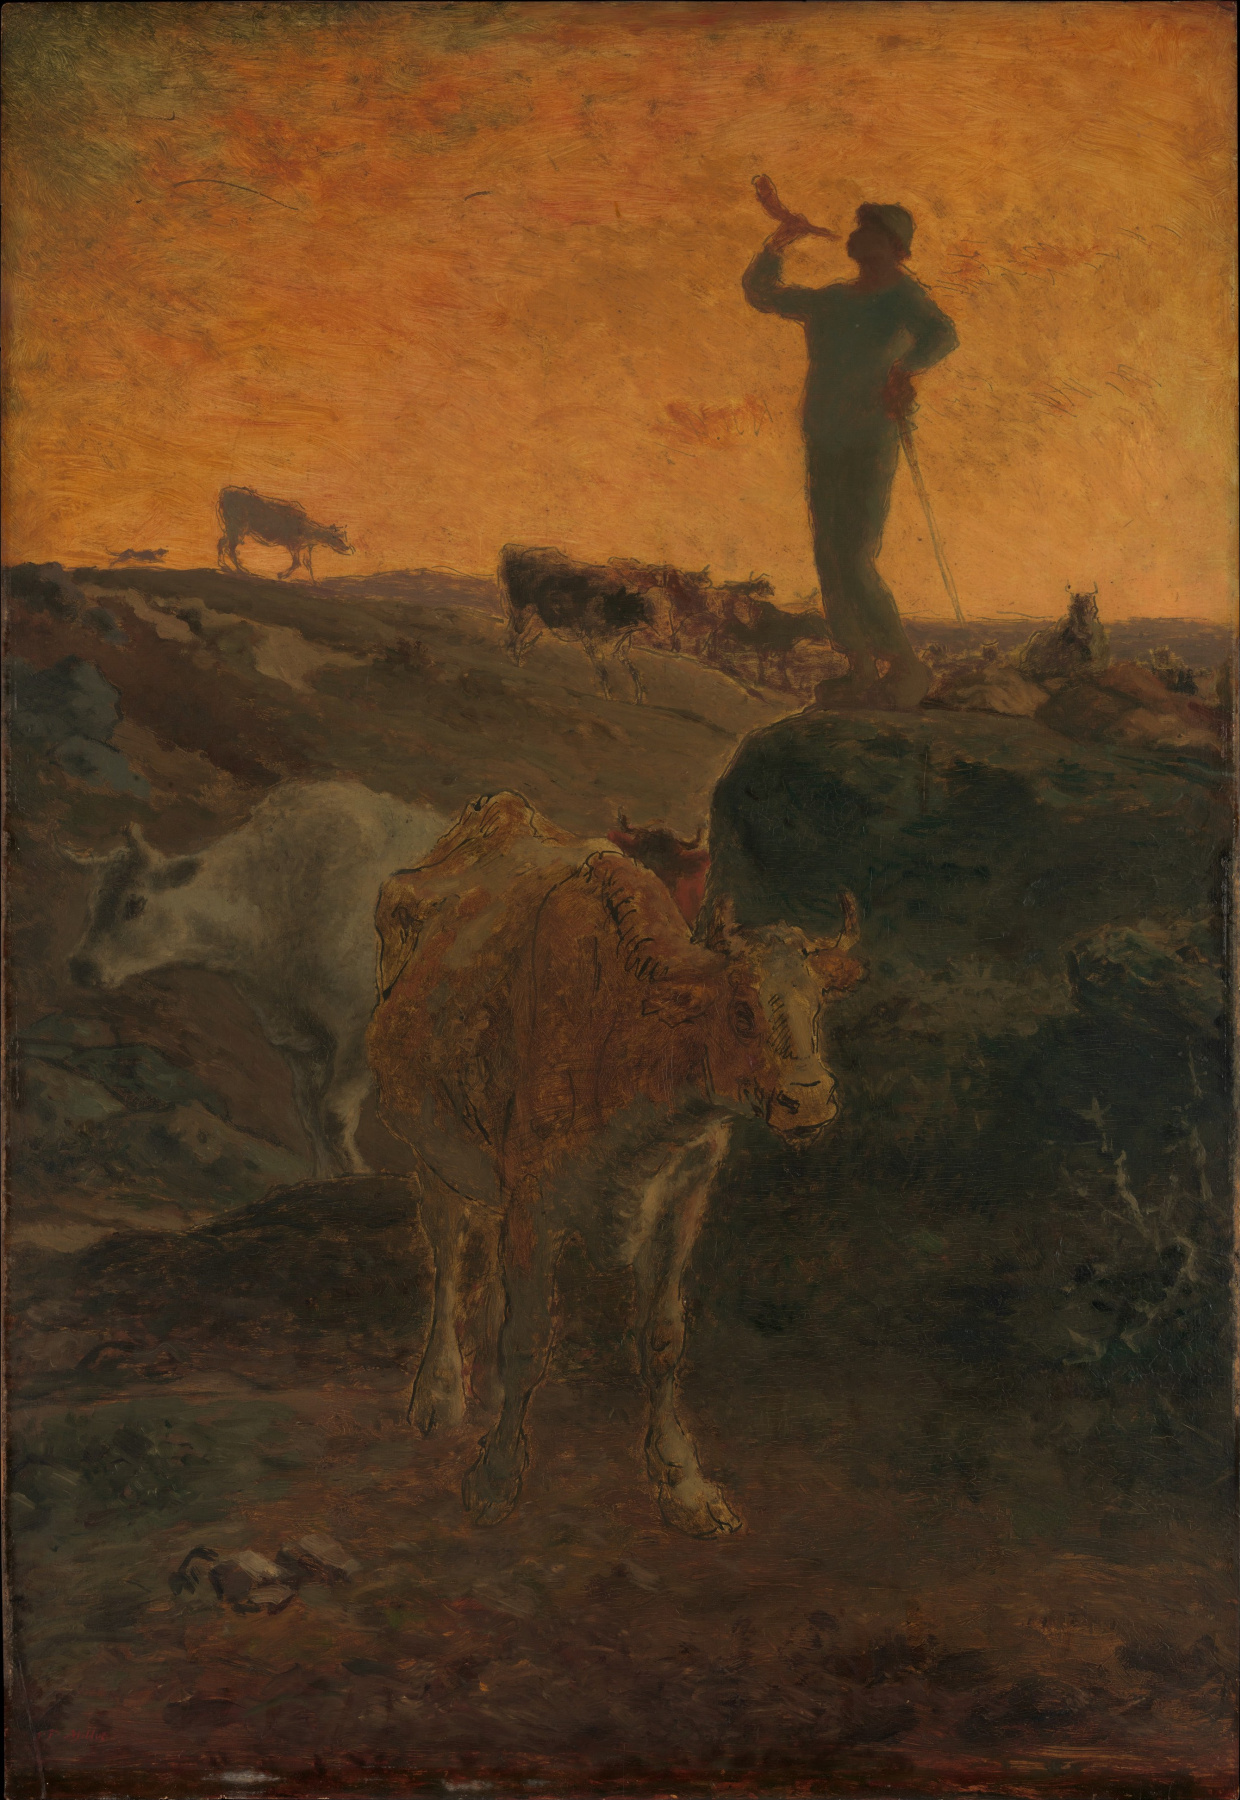 Jean-François Millet. A trumpeting shepherd calling the flock home